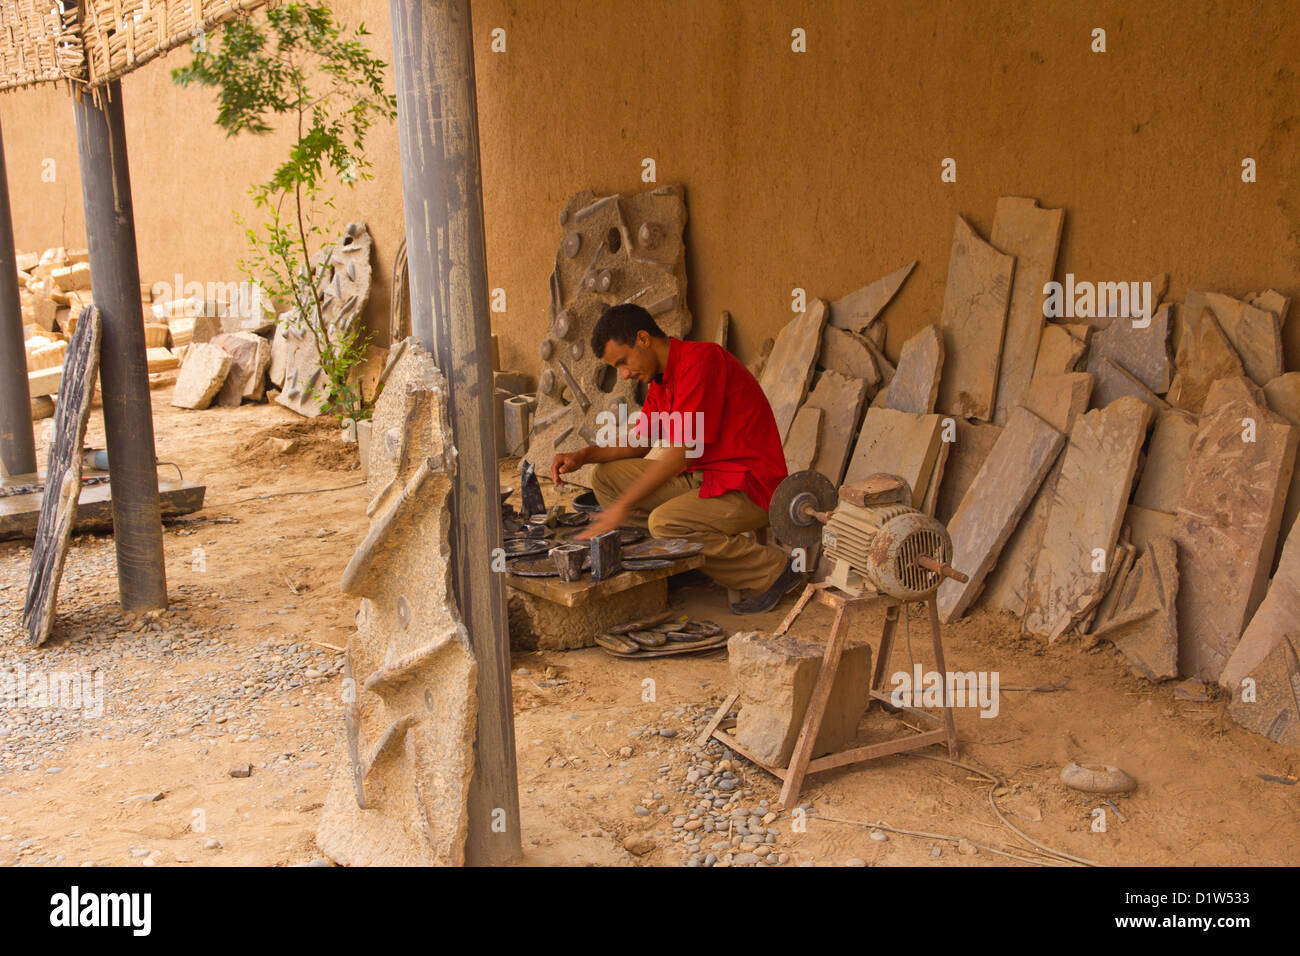 Man sitting polishing and preparing fossils. Stock Photo